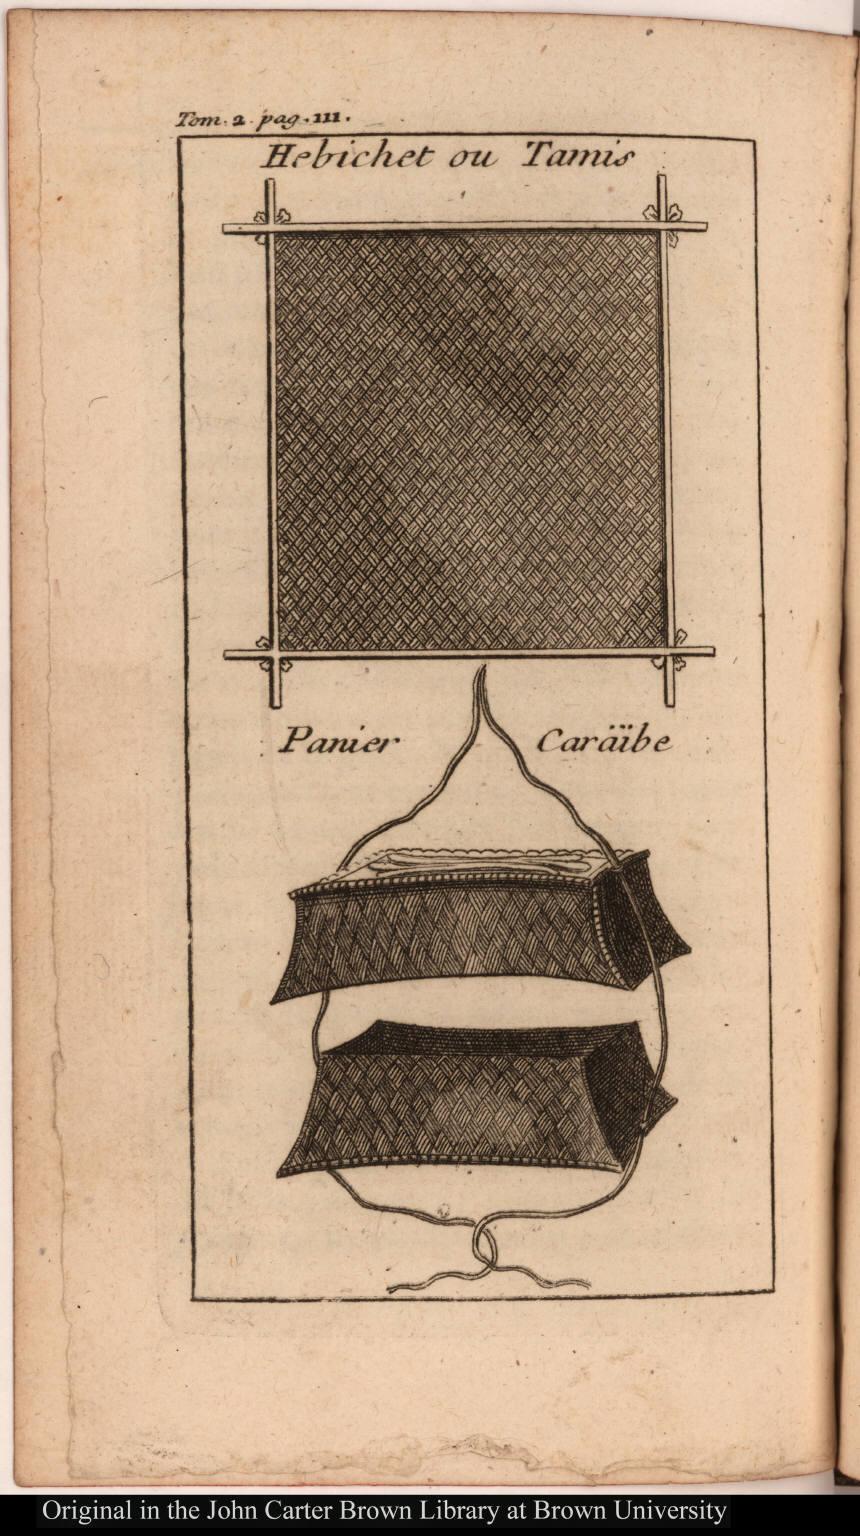 [top] Hebichet ou Tamis [bottom] Panier Caräibe